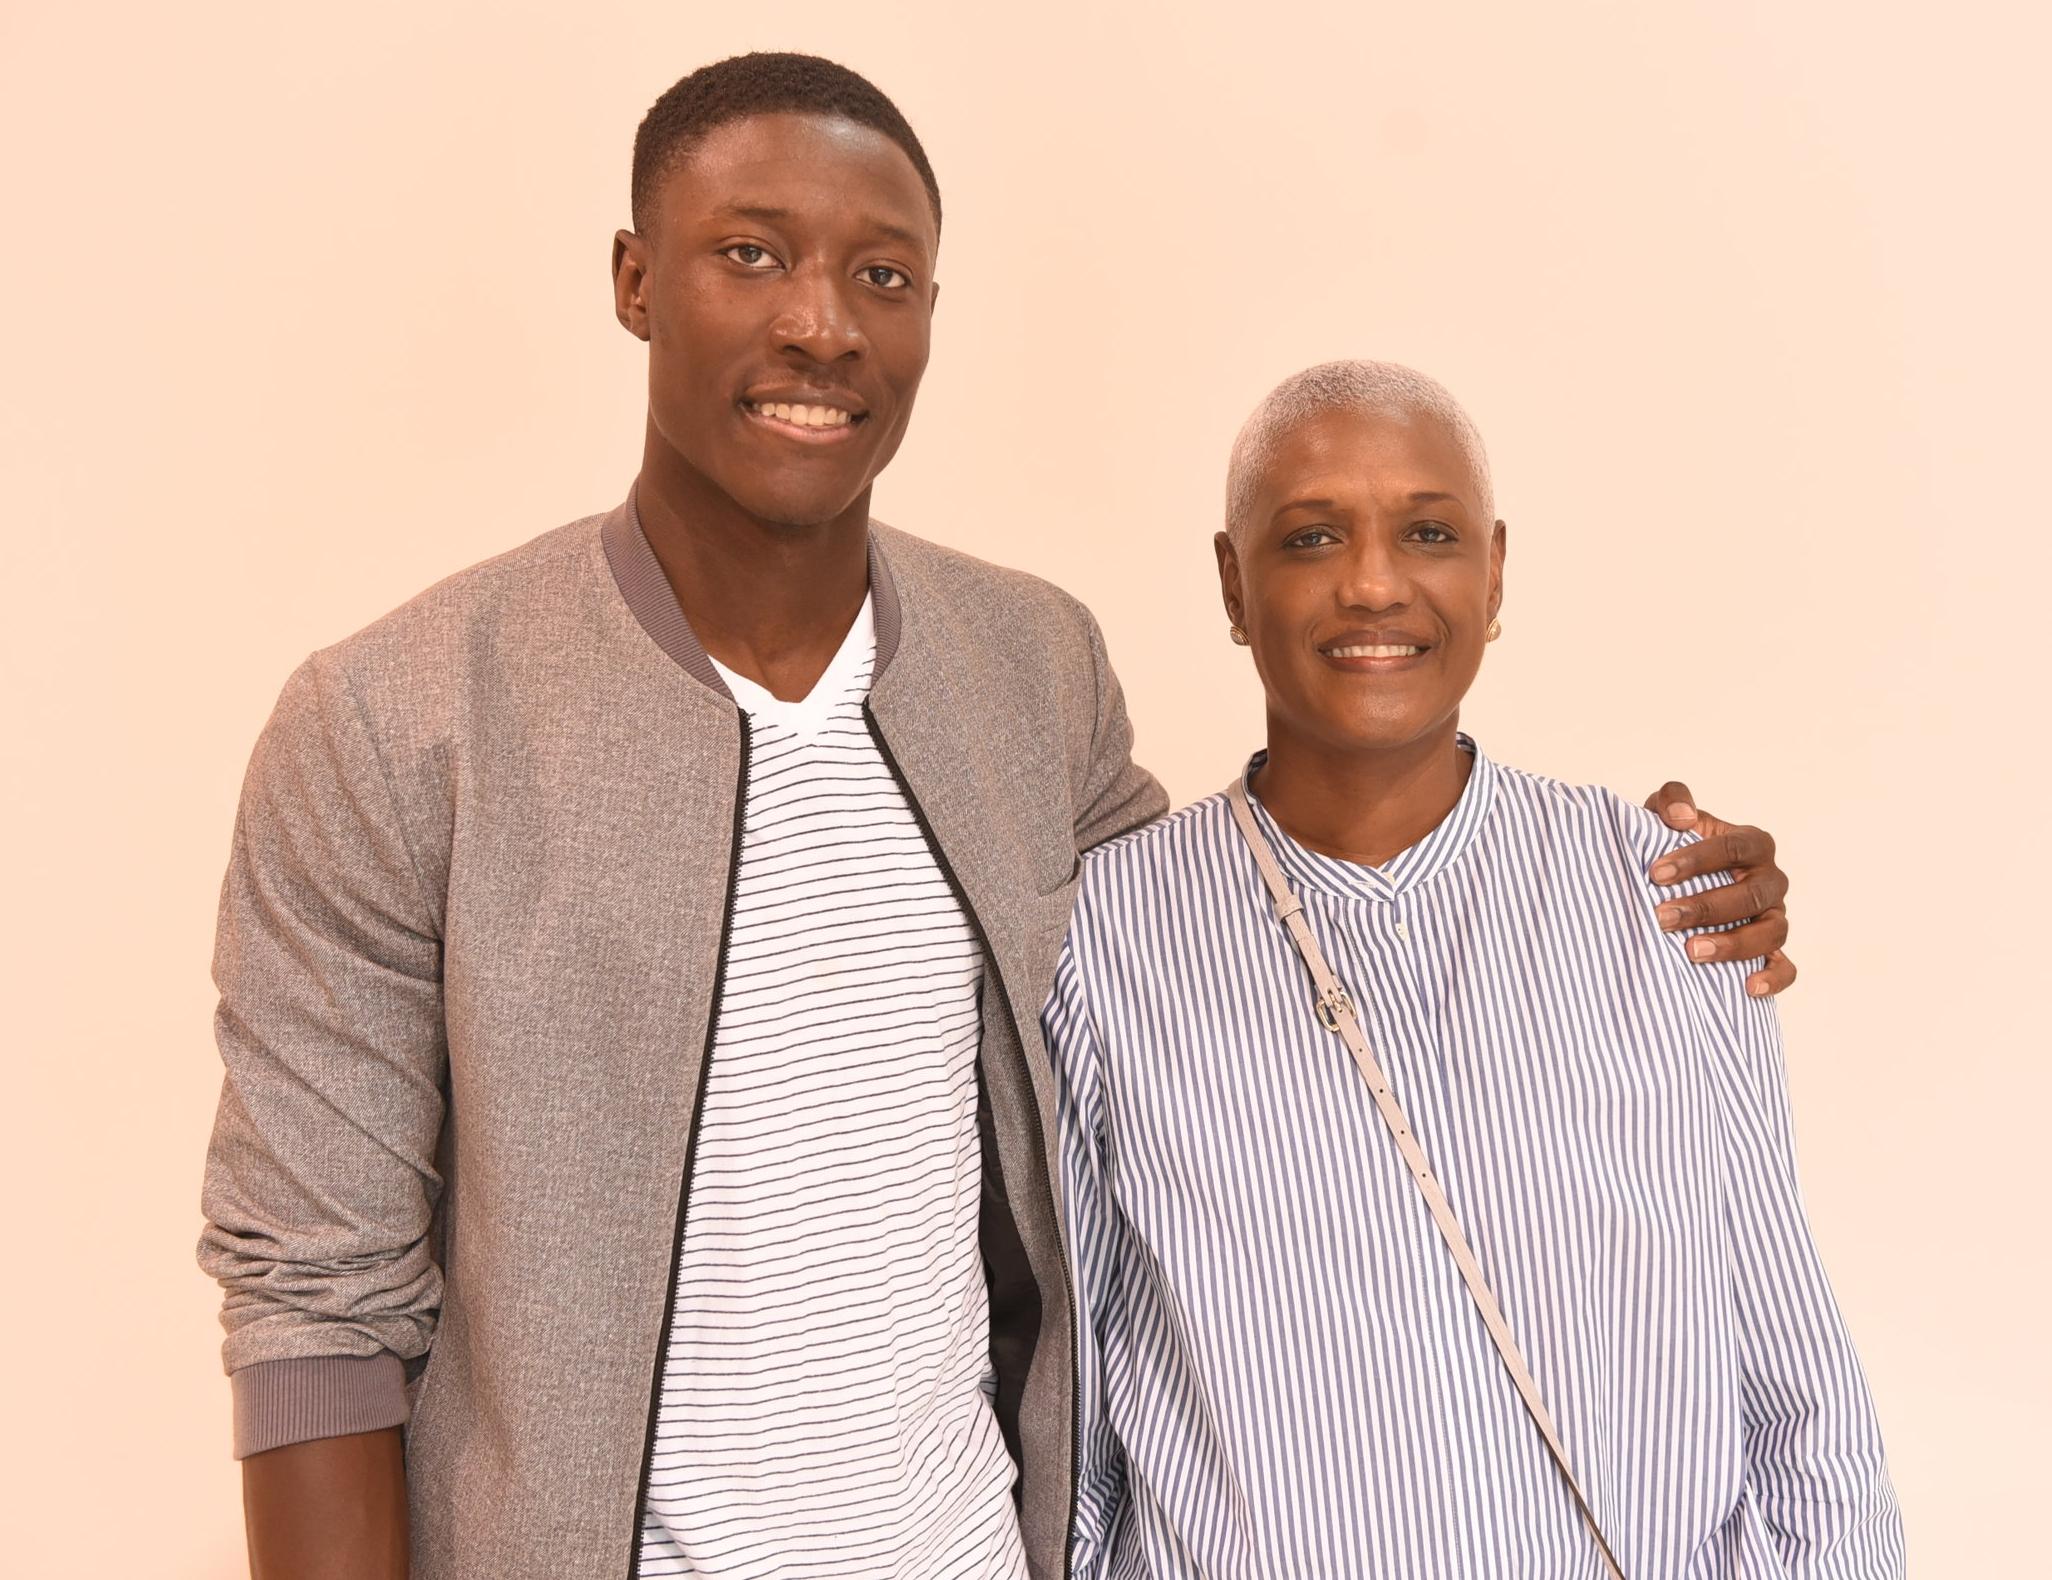 Micah Peters & his mom Marcelle Lambert-Peters